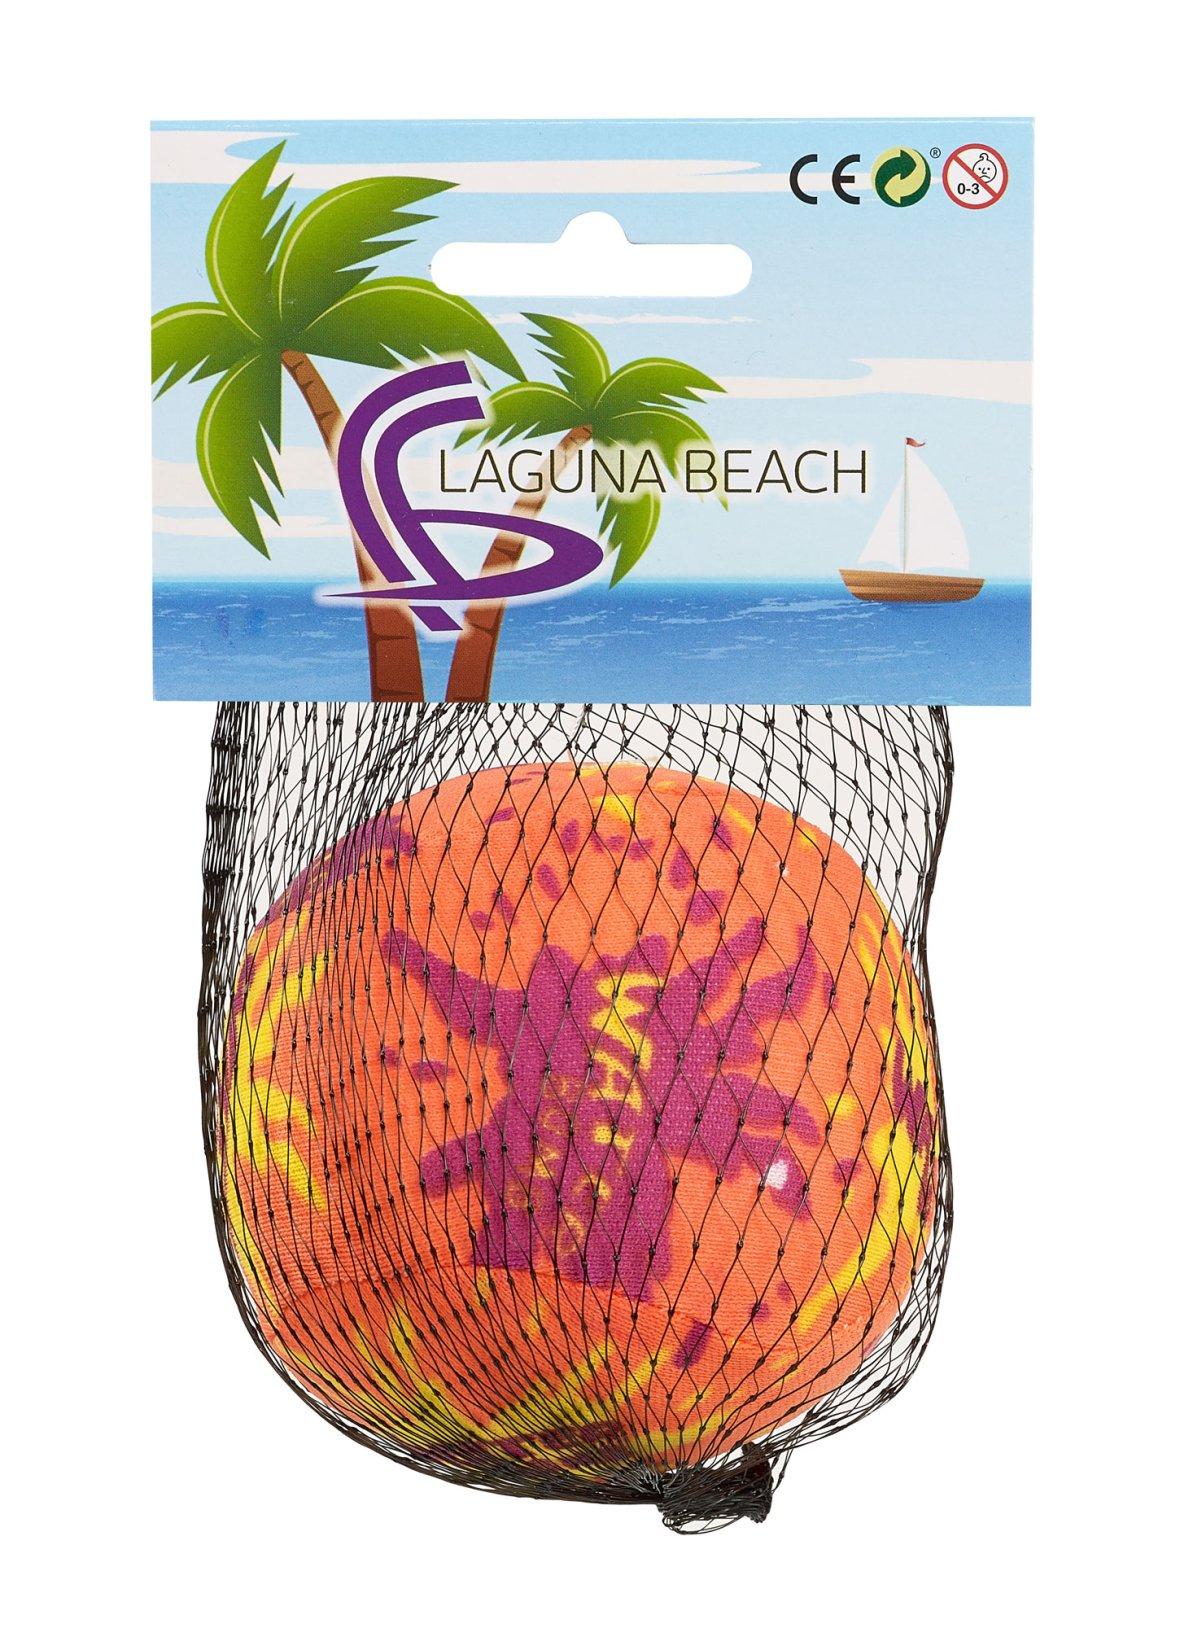 Orange Water bomb ball